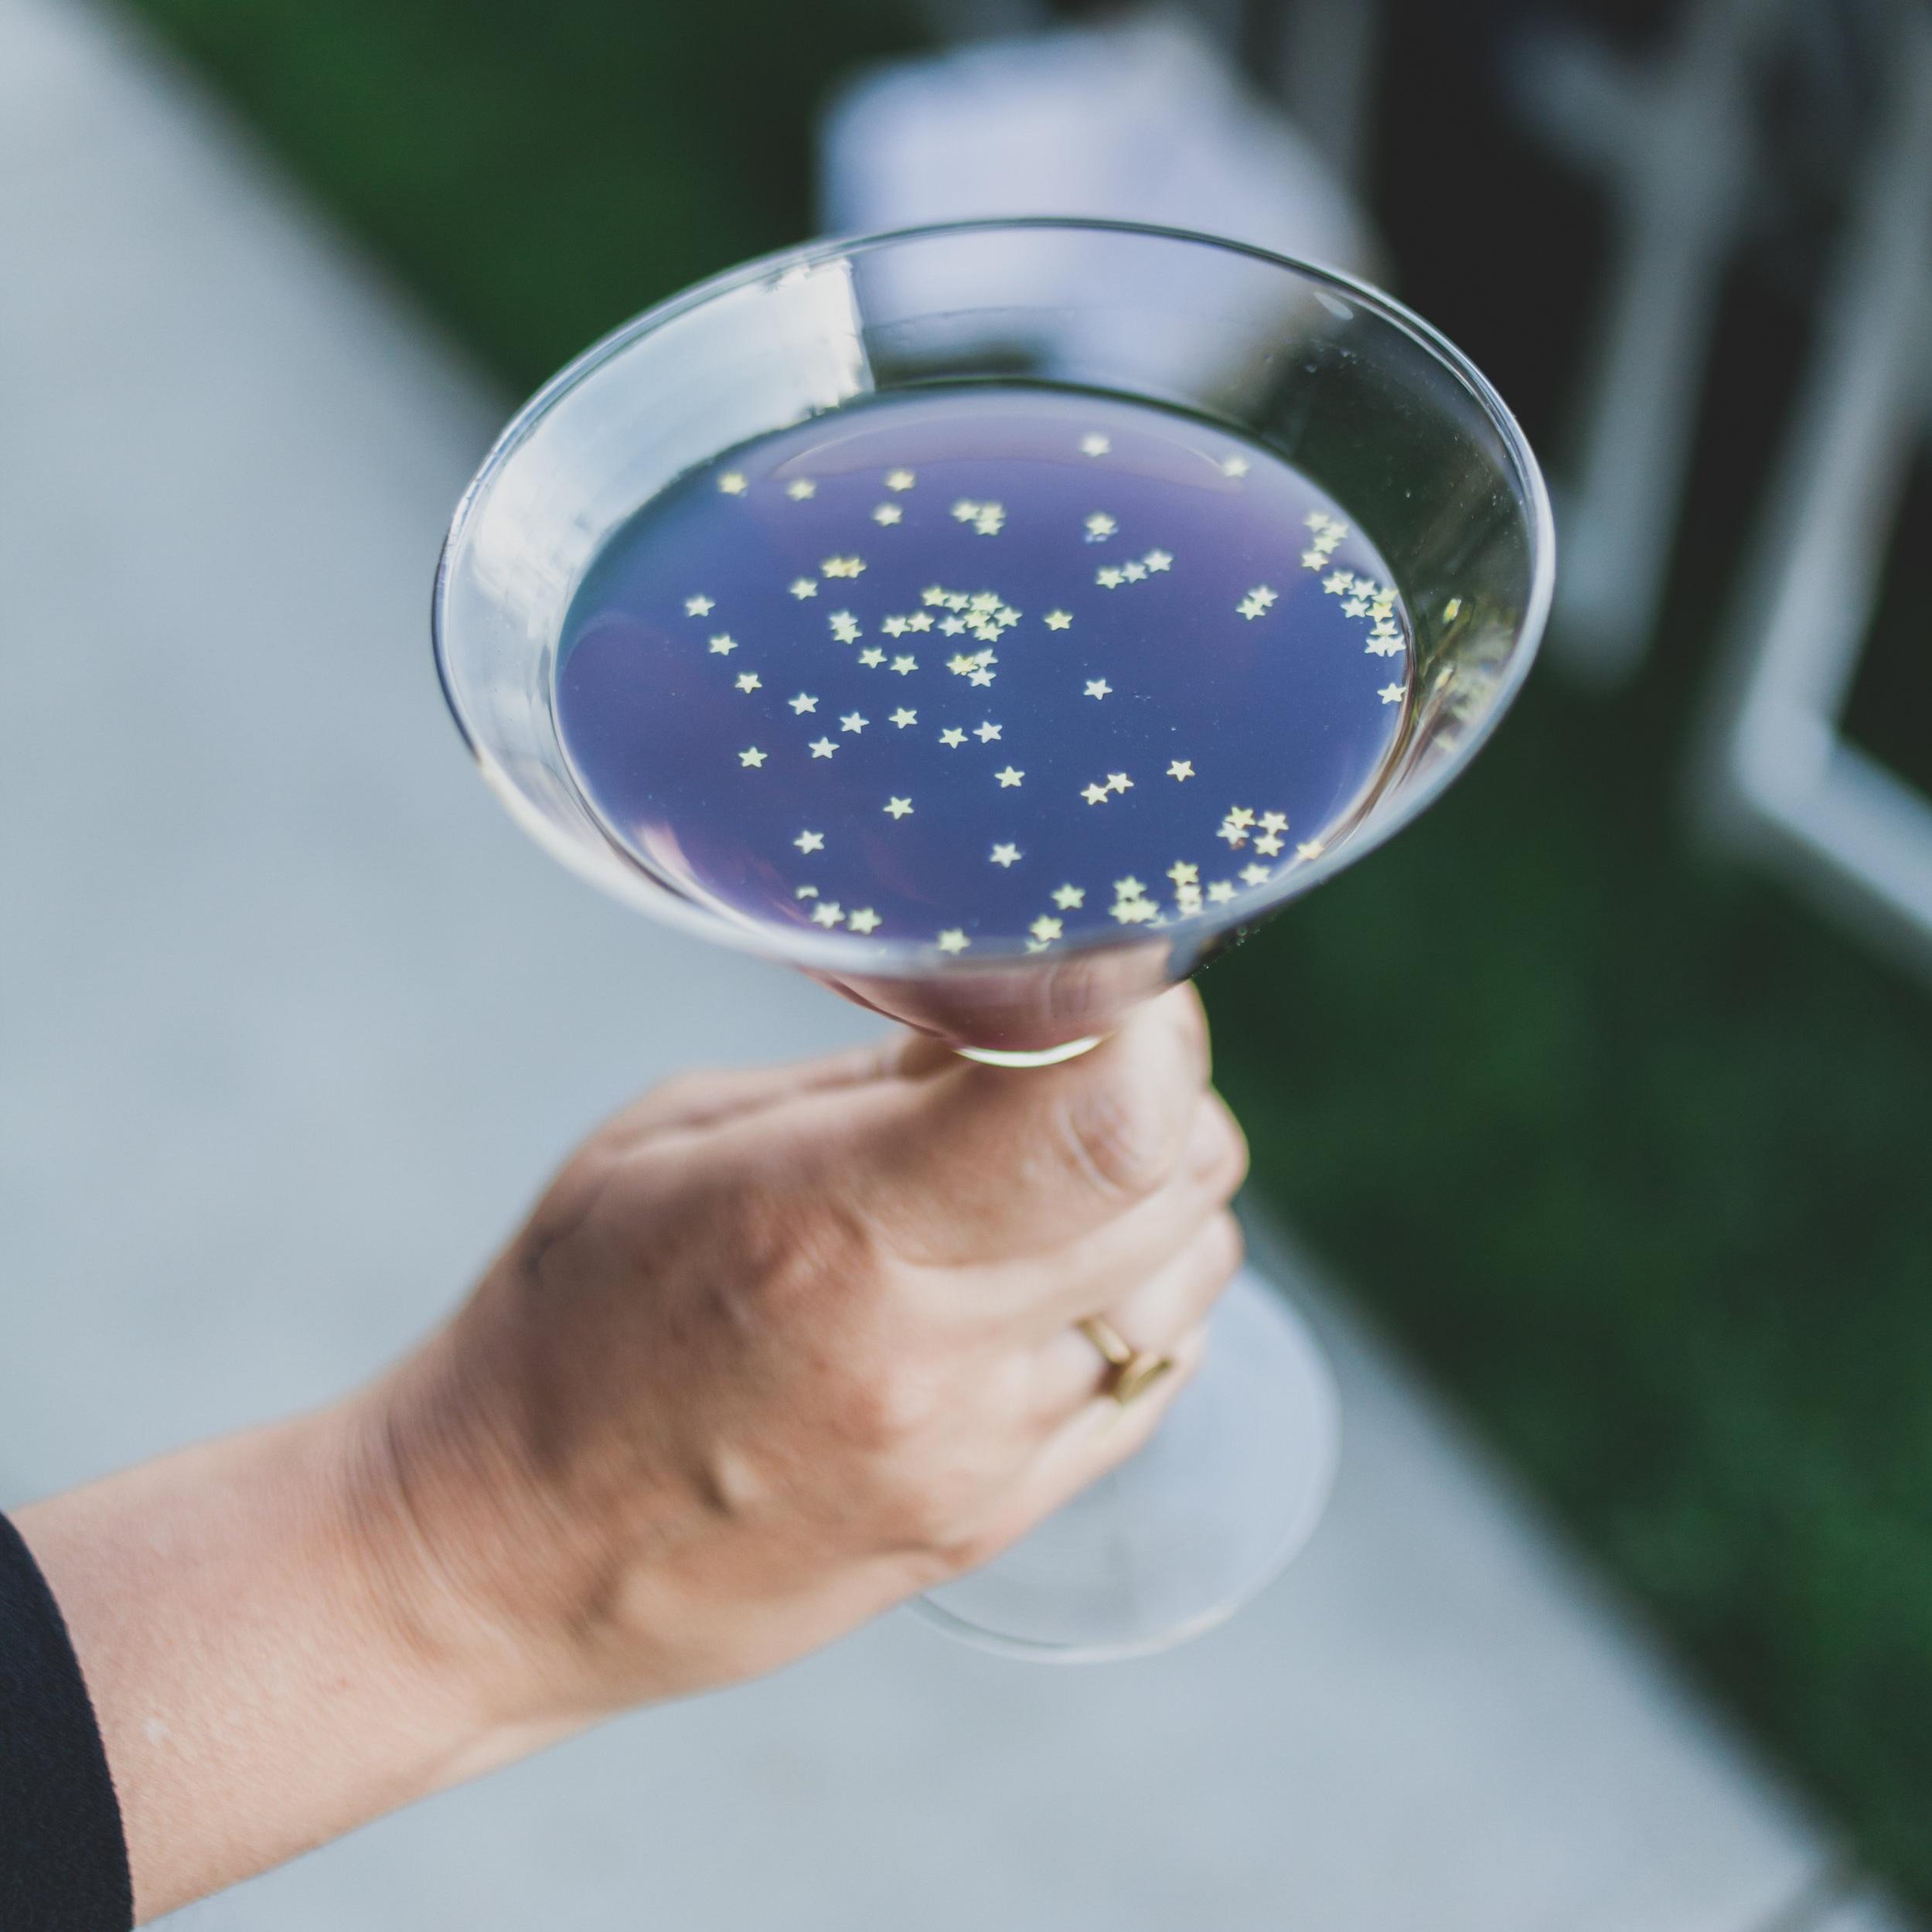 Modern Wedding Theme - Martinis garnished with floating star confetti.